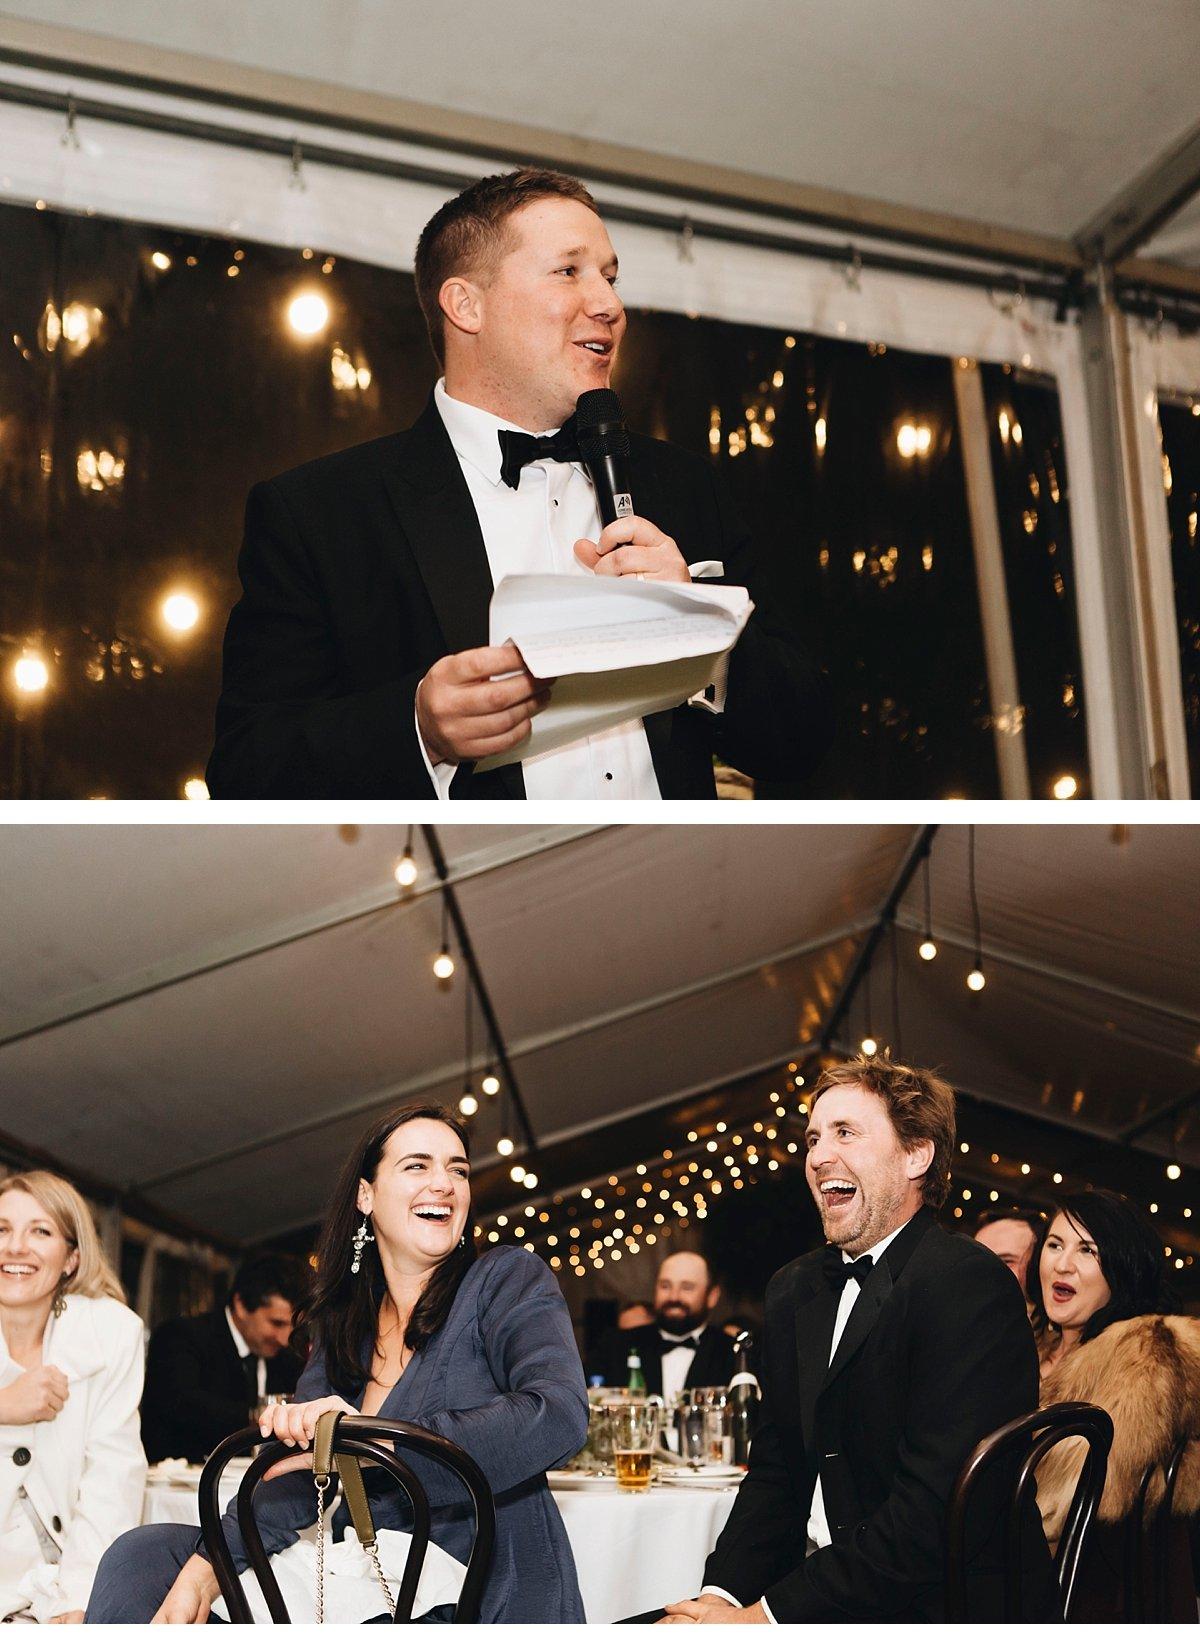 Gundagai Wedding Photographer NSW photographers Wagga Wagga Albury Rutherglen30